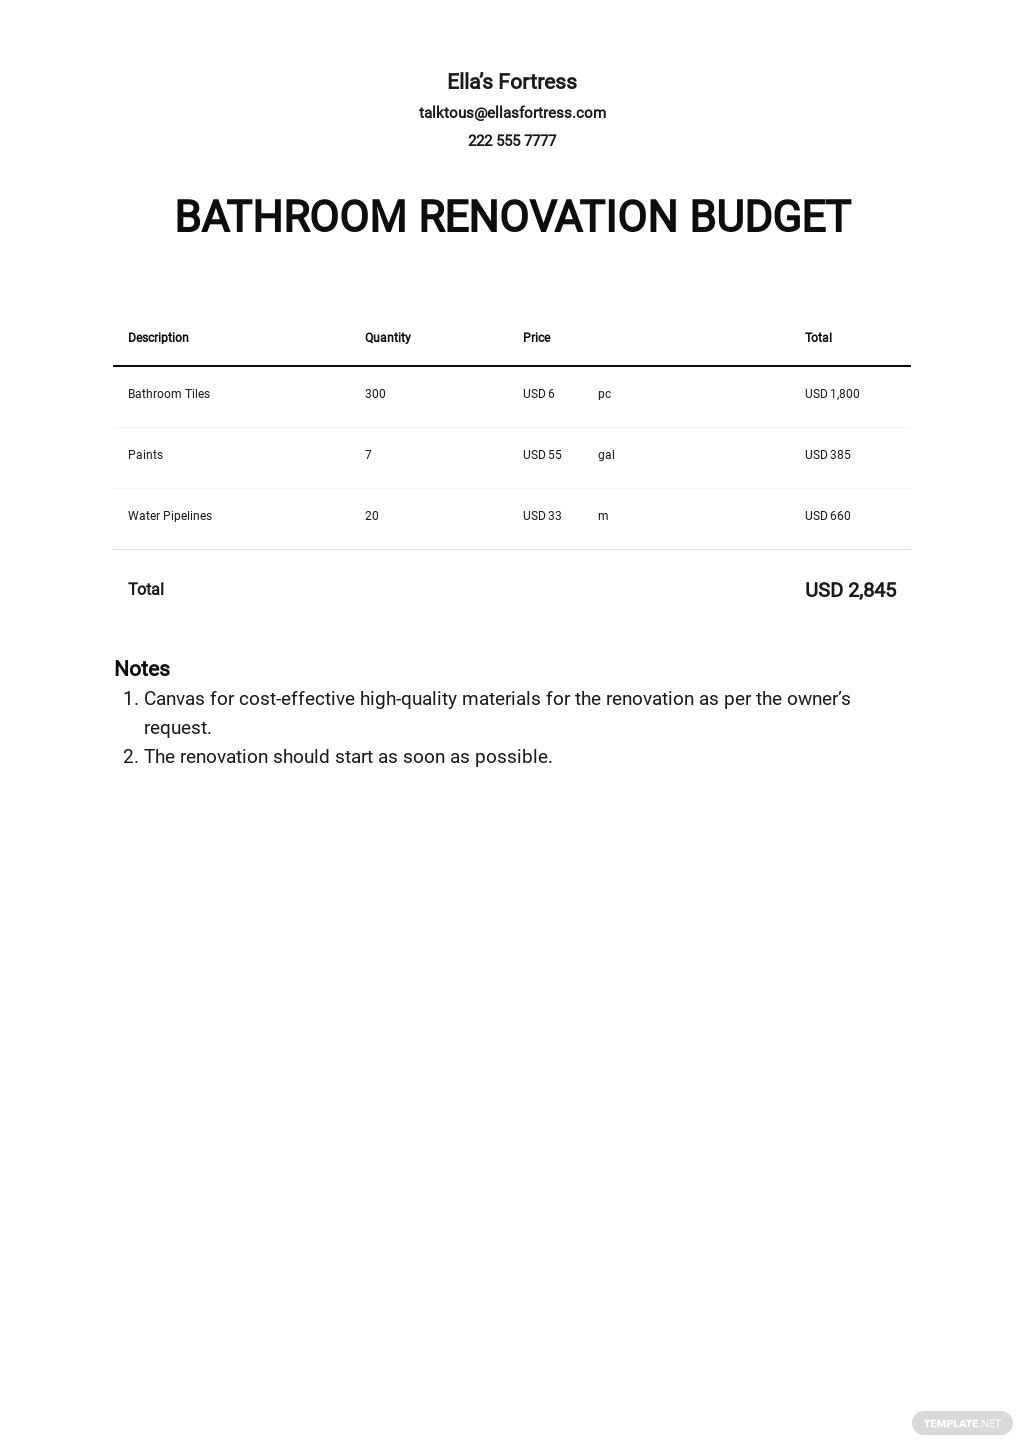 Bathroom Renovation Budget Template.jpe